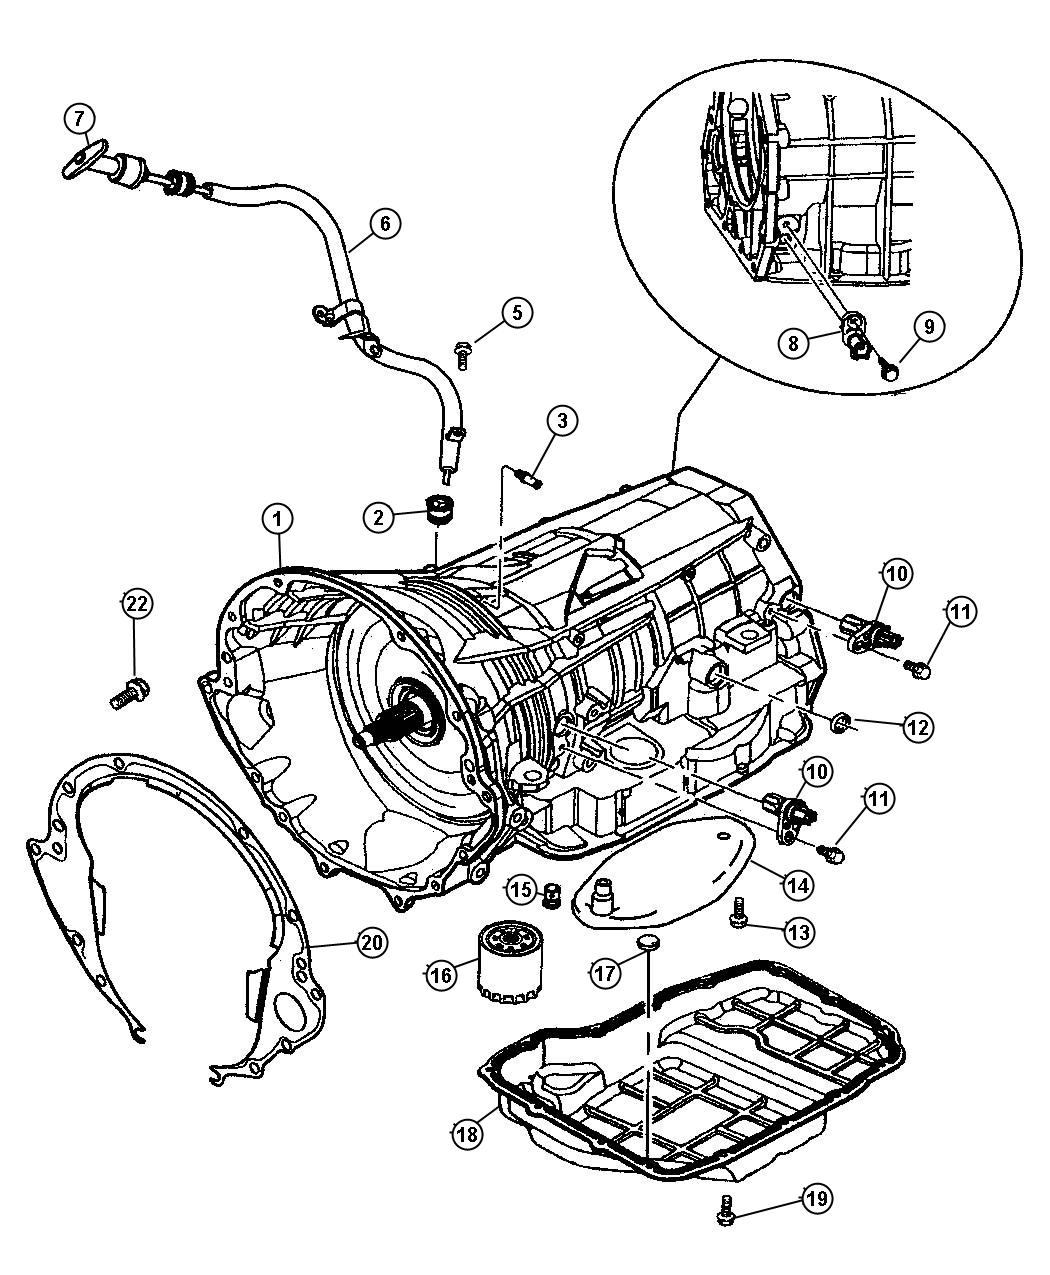 Wiring Diagram 34 Dodge Dakota Parts Diagram